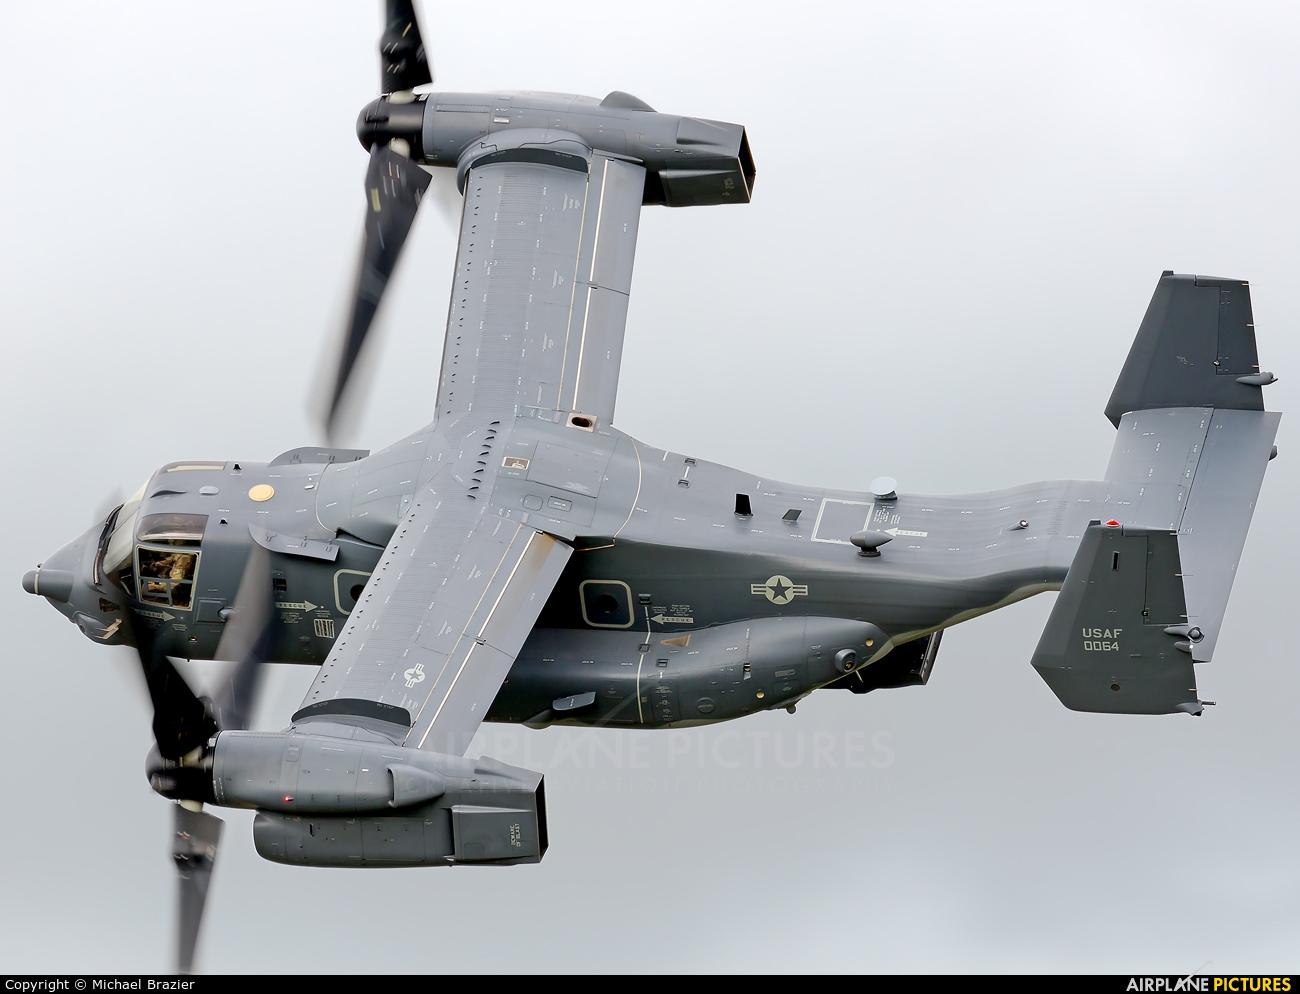 USA - Air Force 12-0064 aircraft at Fairford